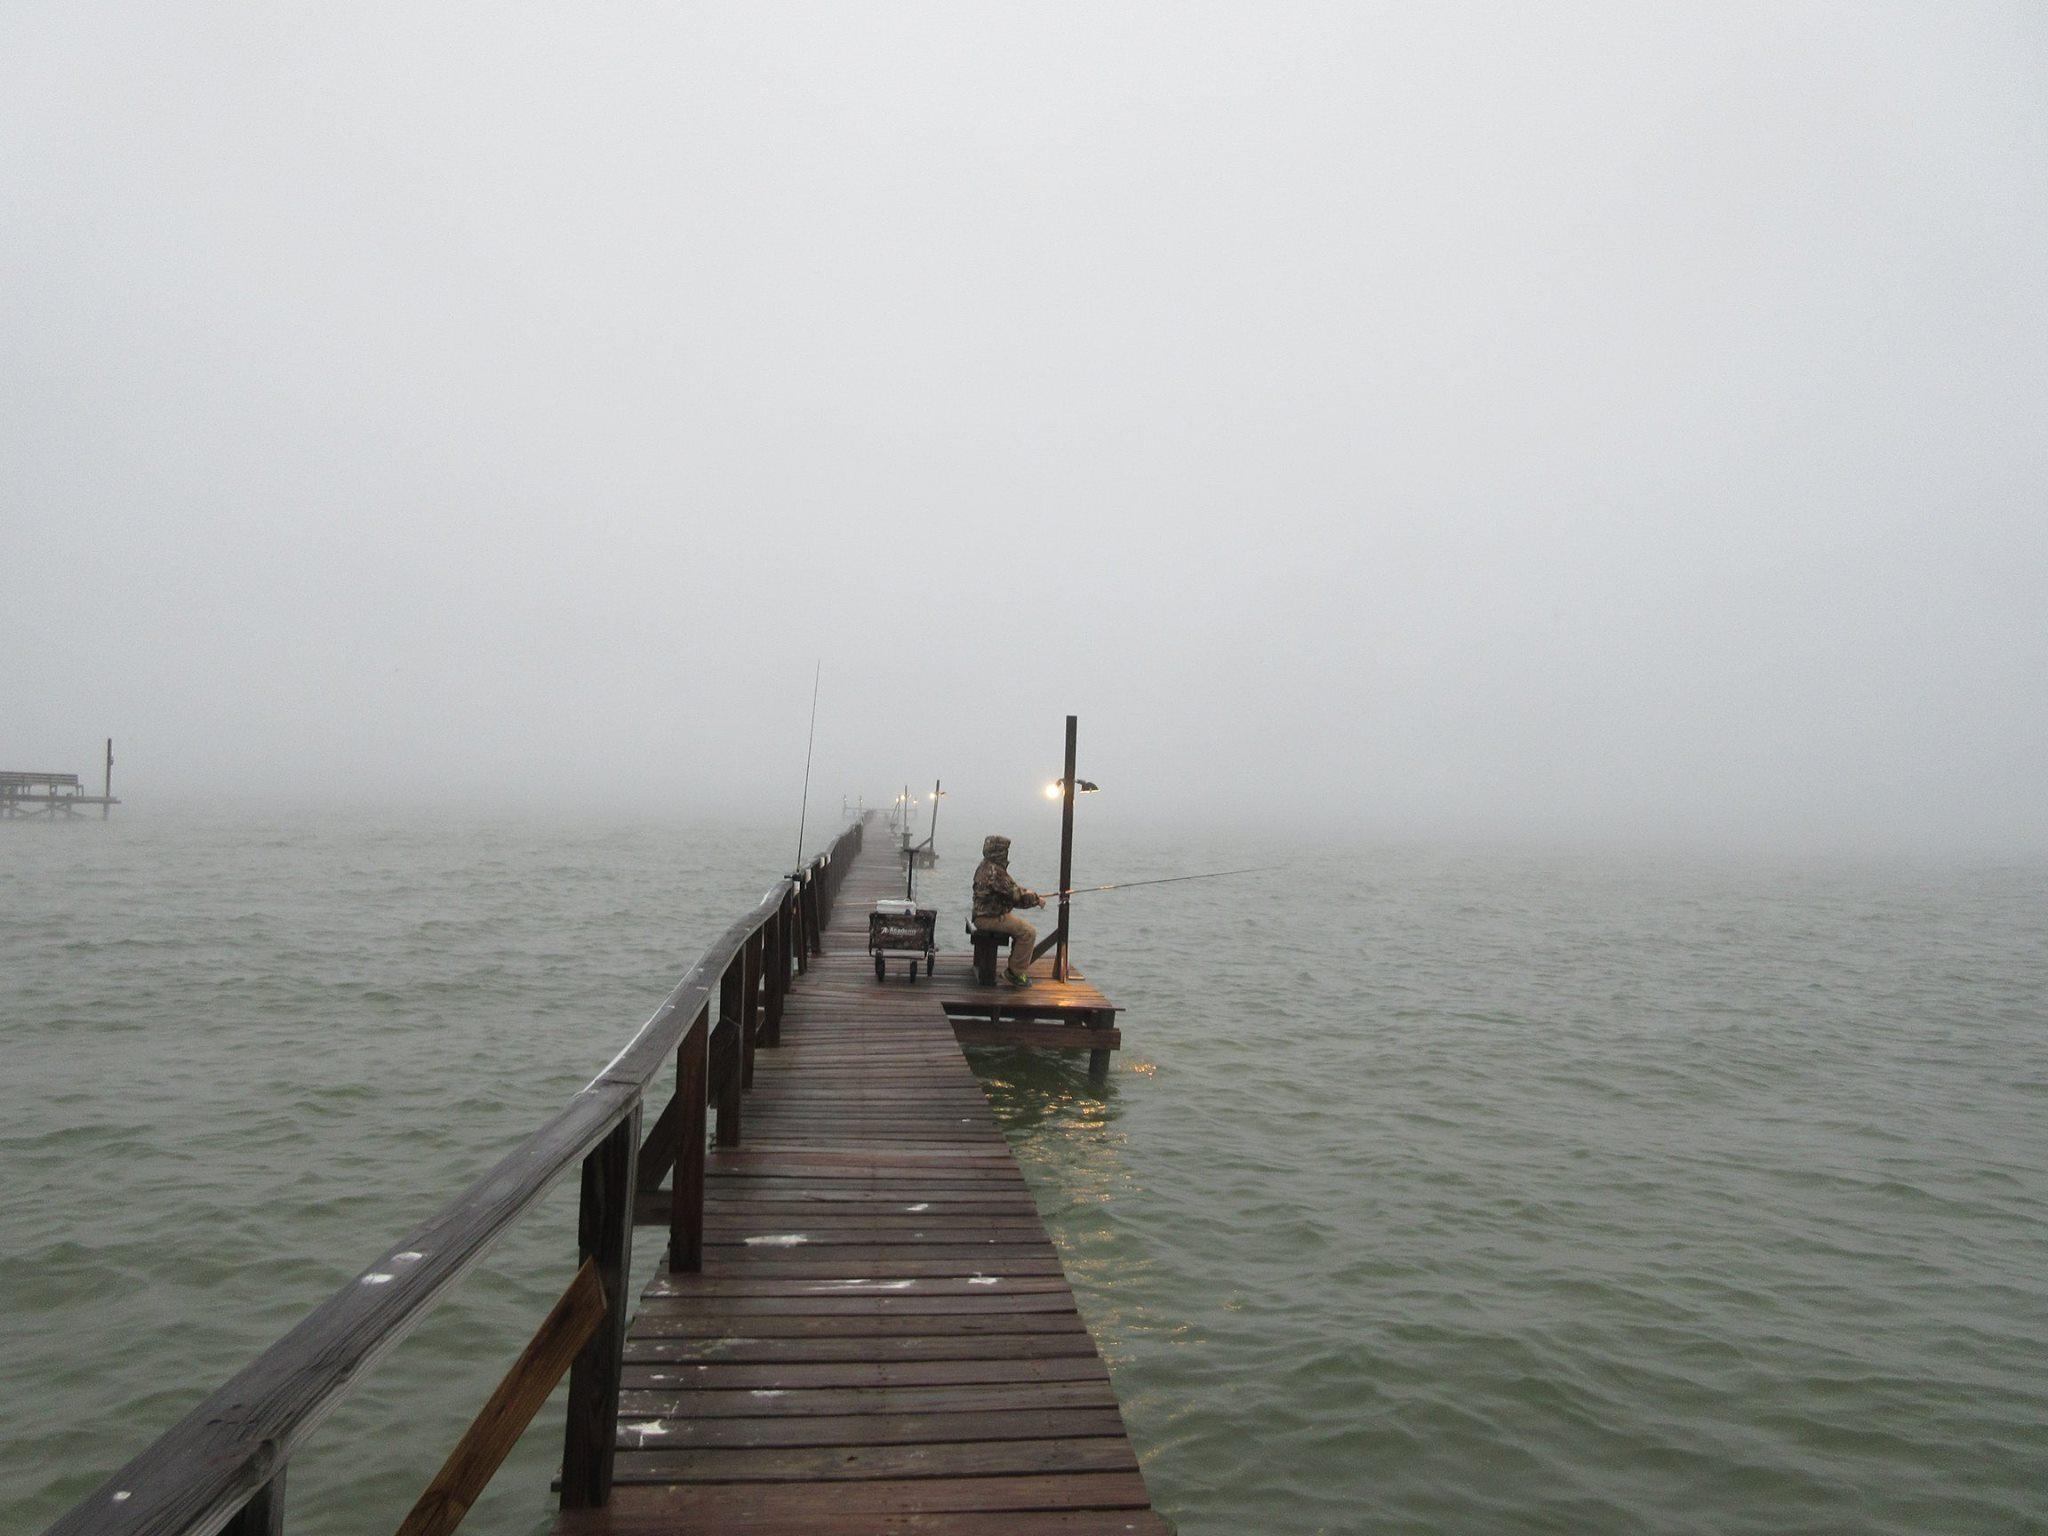 Jfishing